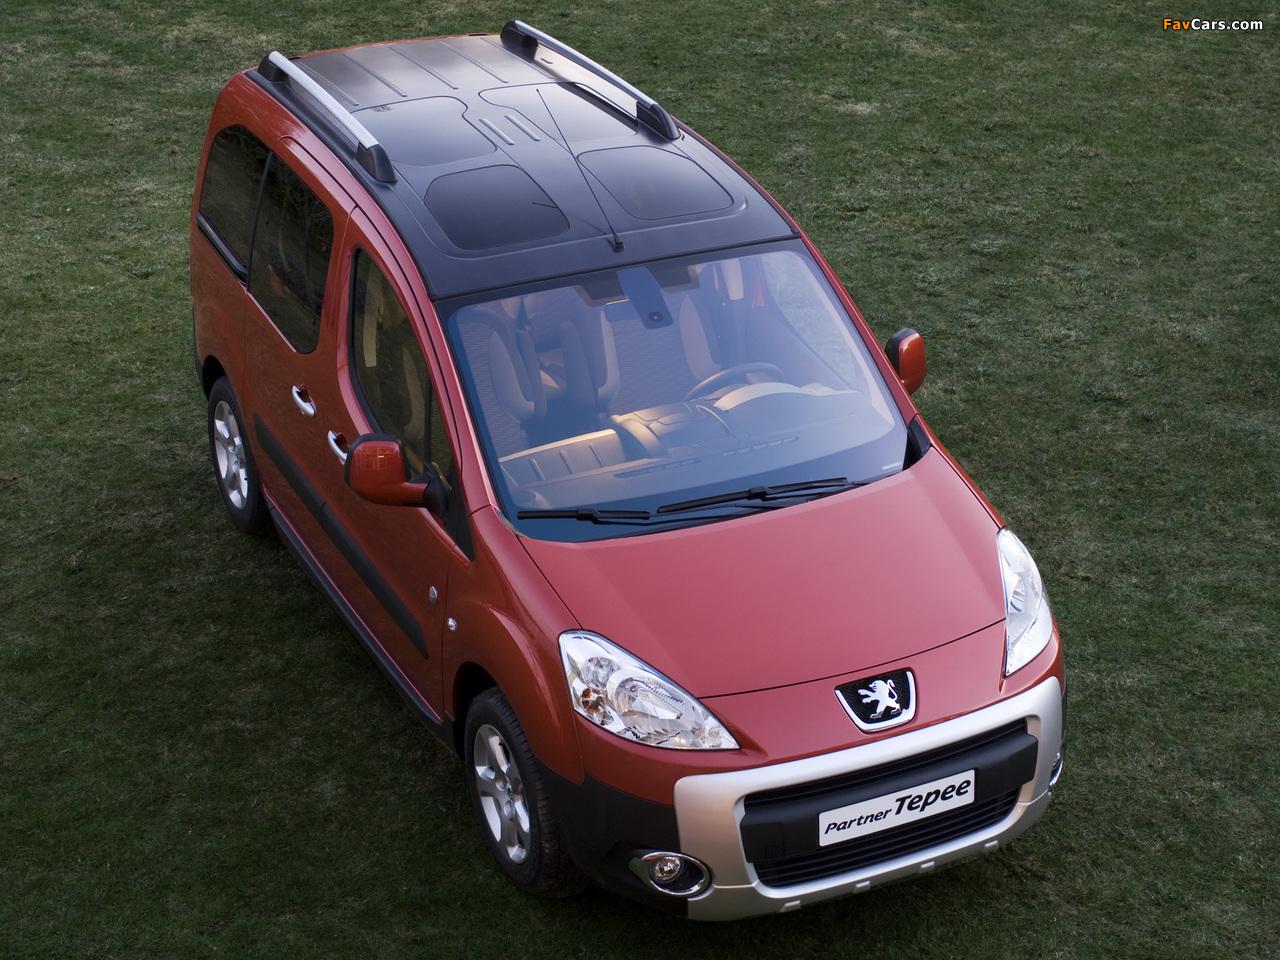 Peugeot Partner Tepee Outdoor Pack 2010 photos (1280 x 960)